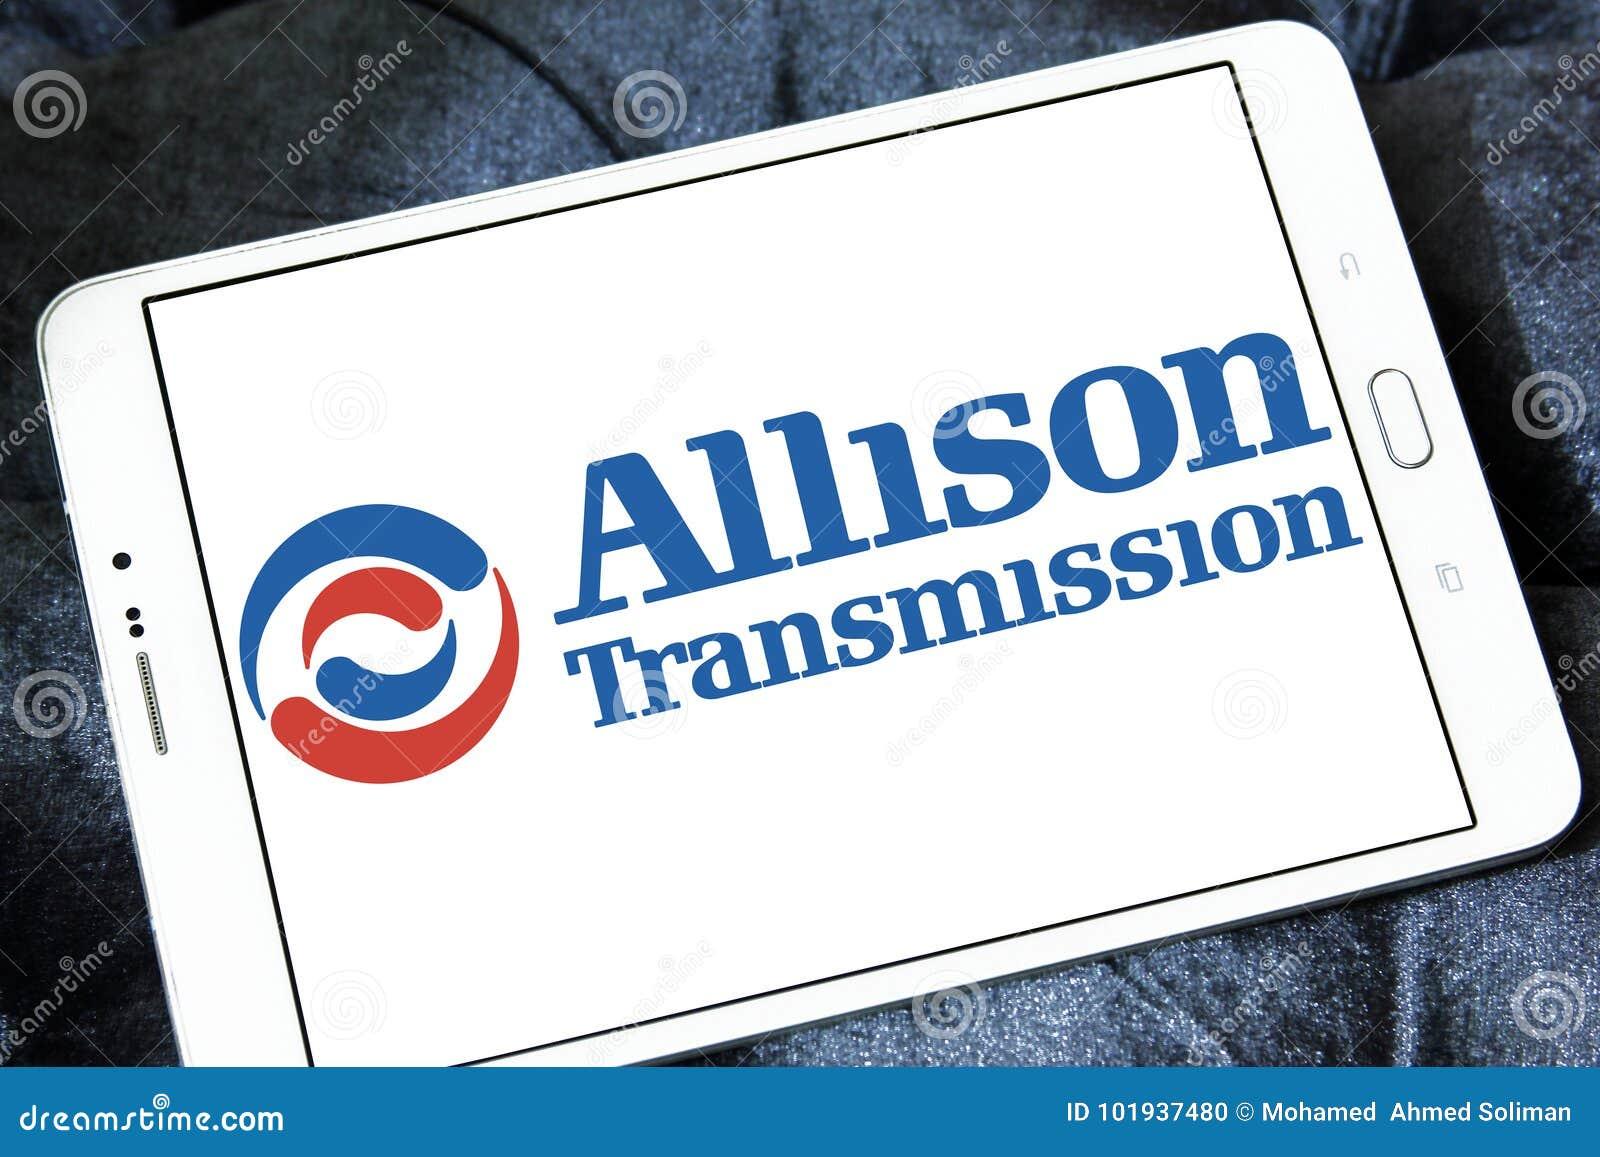 Allison Transmission Logo Editorial Image Image Of Propulsion 101937480